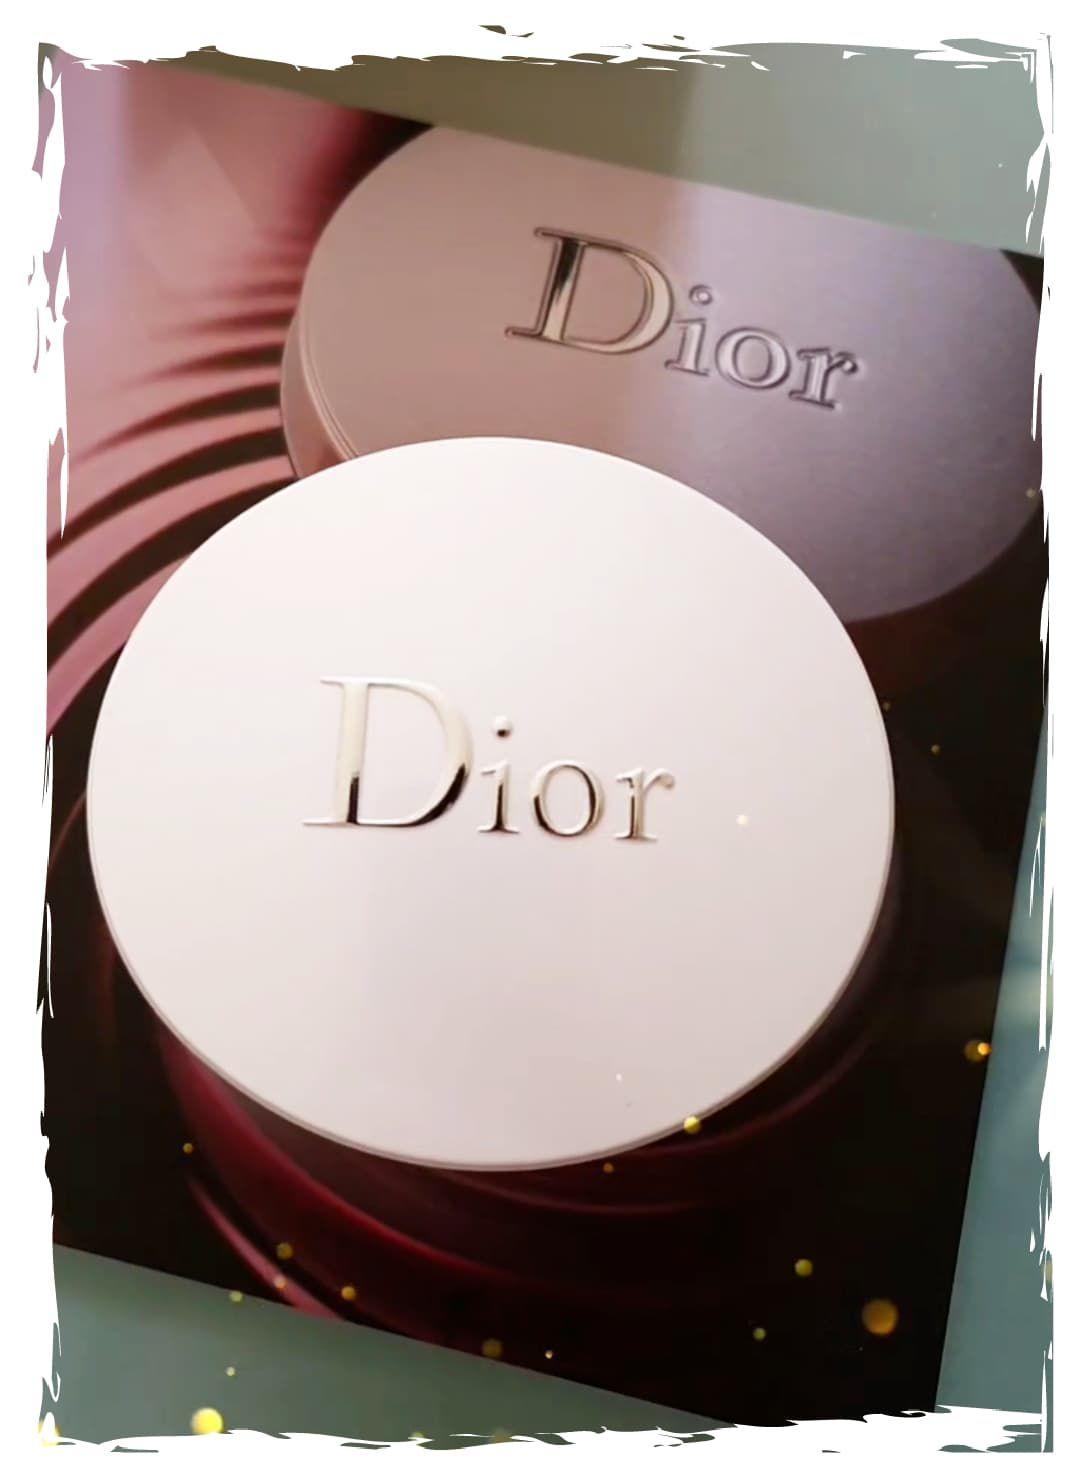 Merci Dior pour ma bonne mine